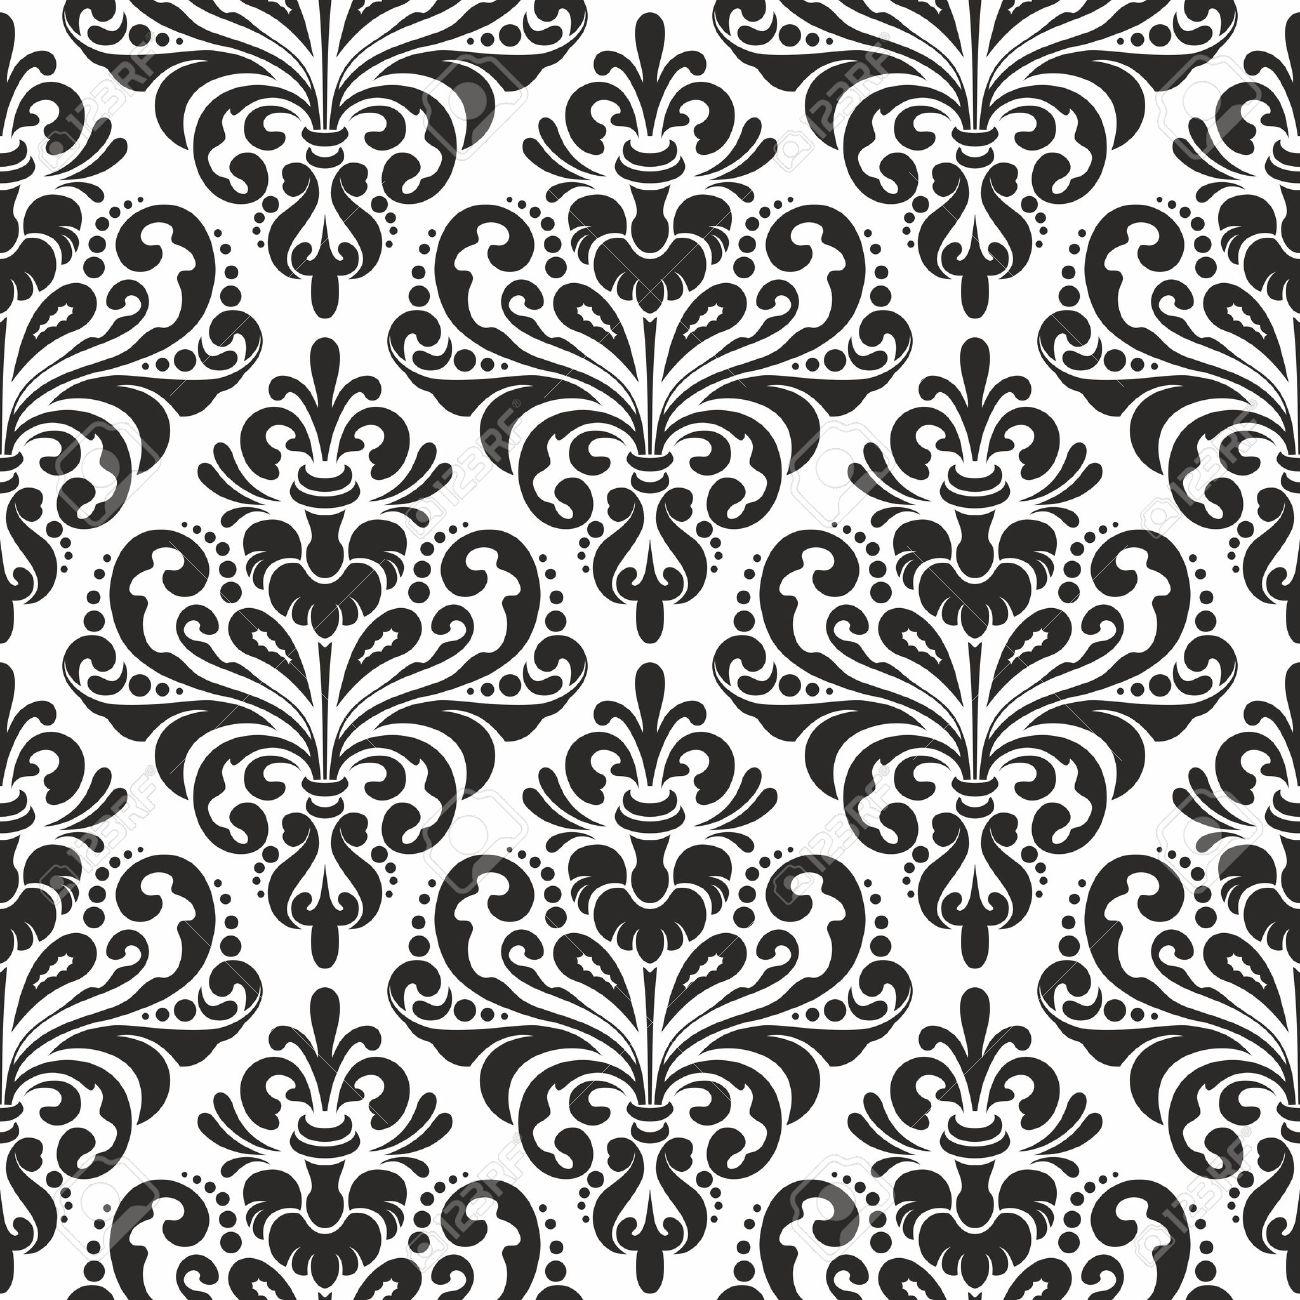 Black And White Seamless Damask Wallpaper Pattern